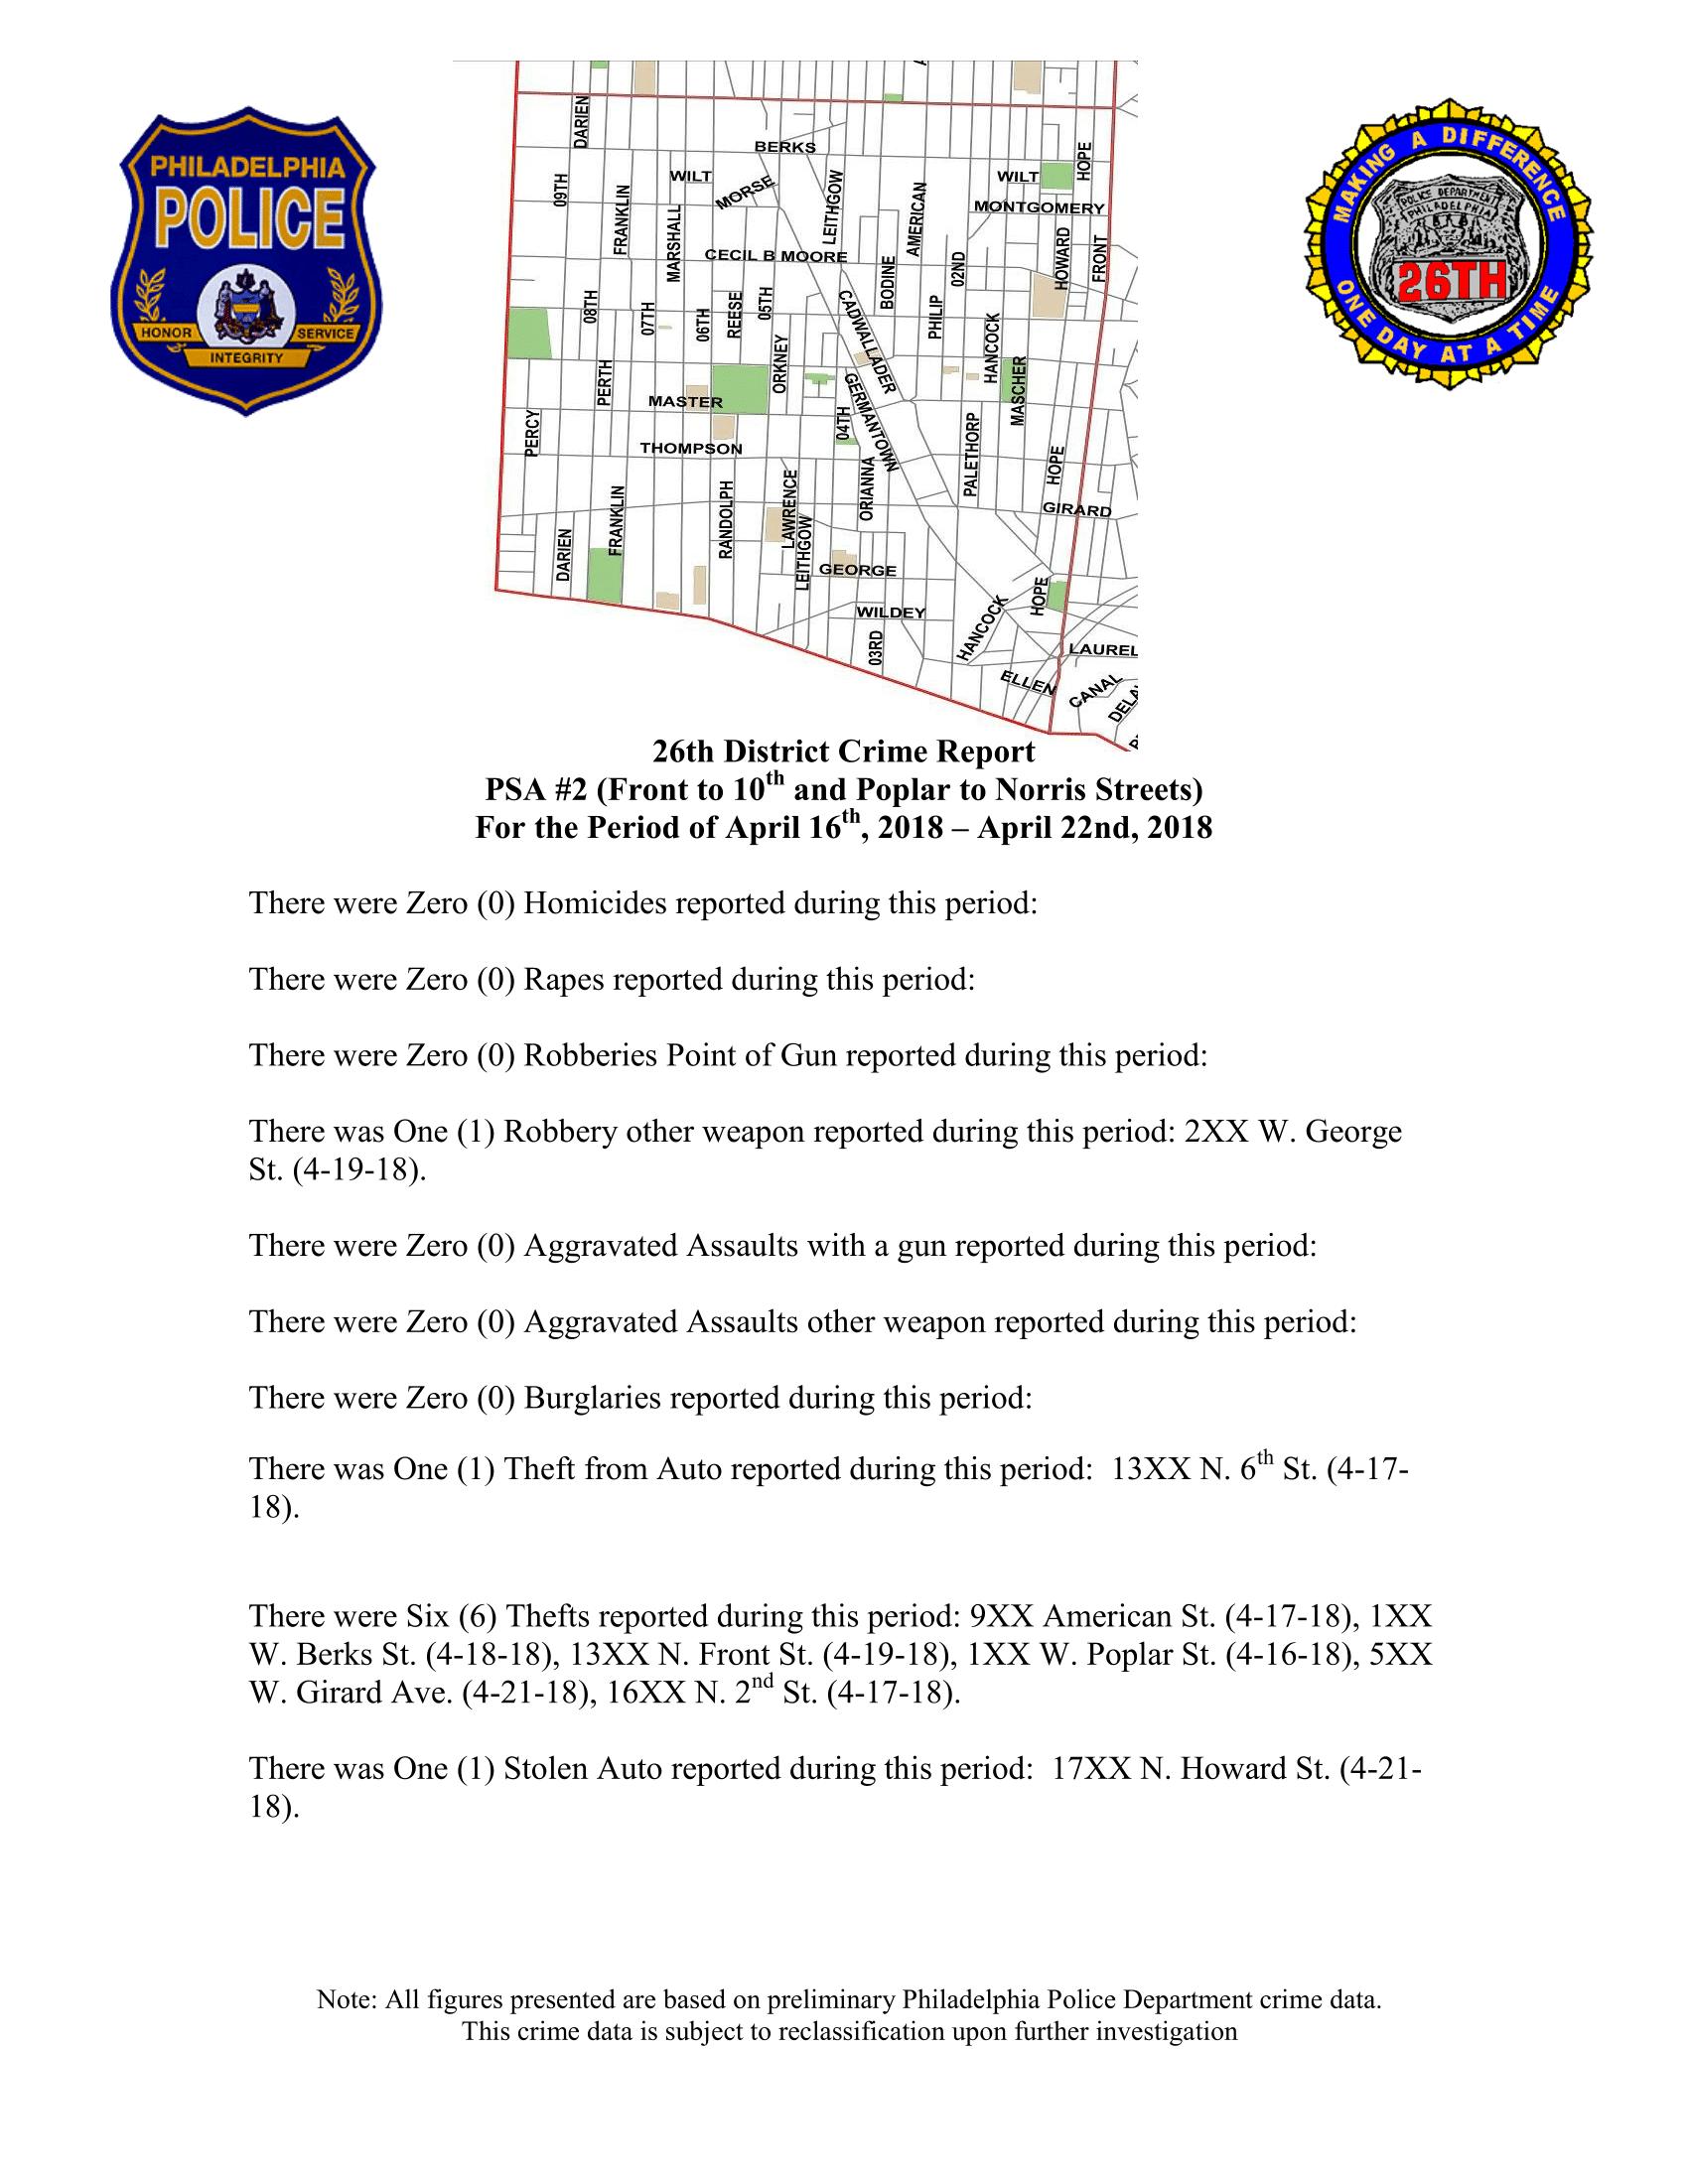 PSA #2 4-22-18-1.png